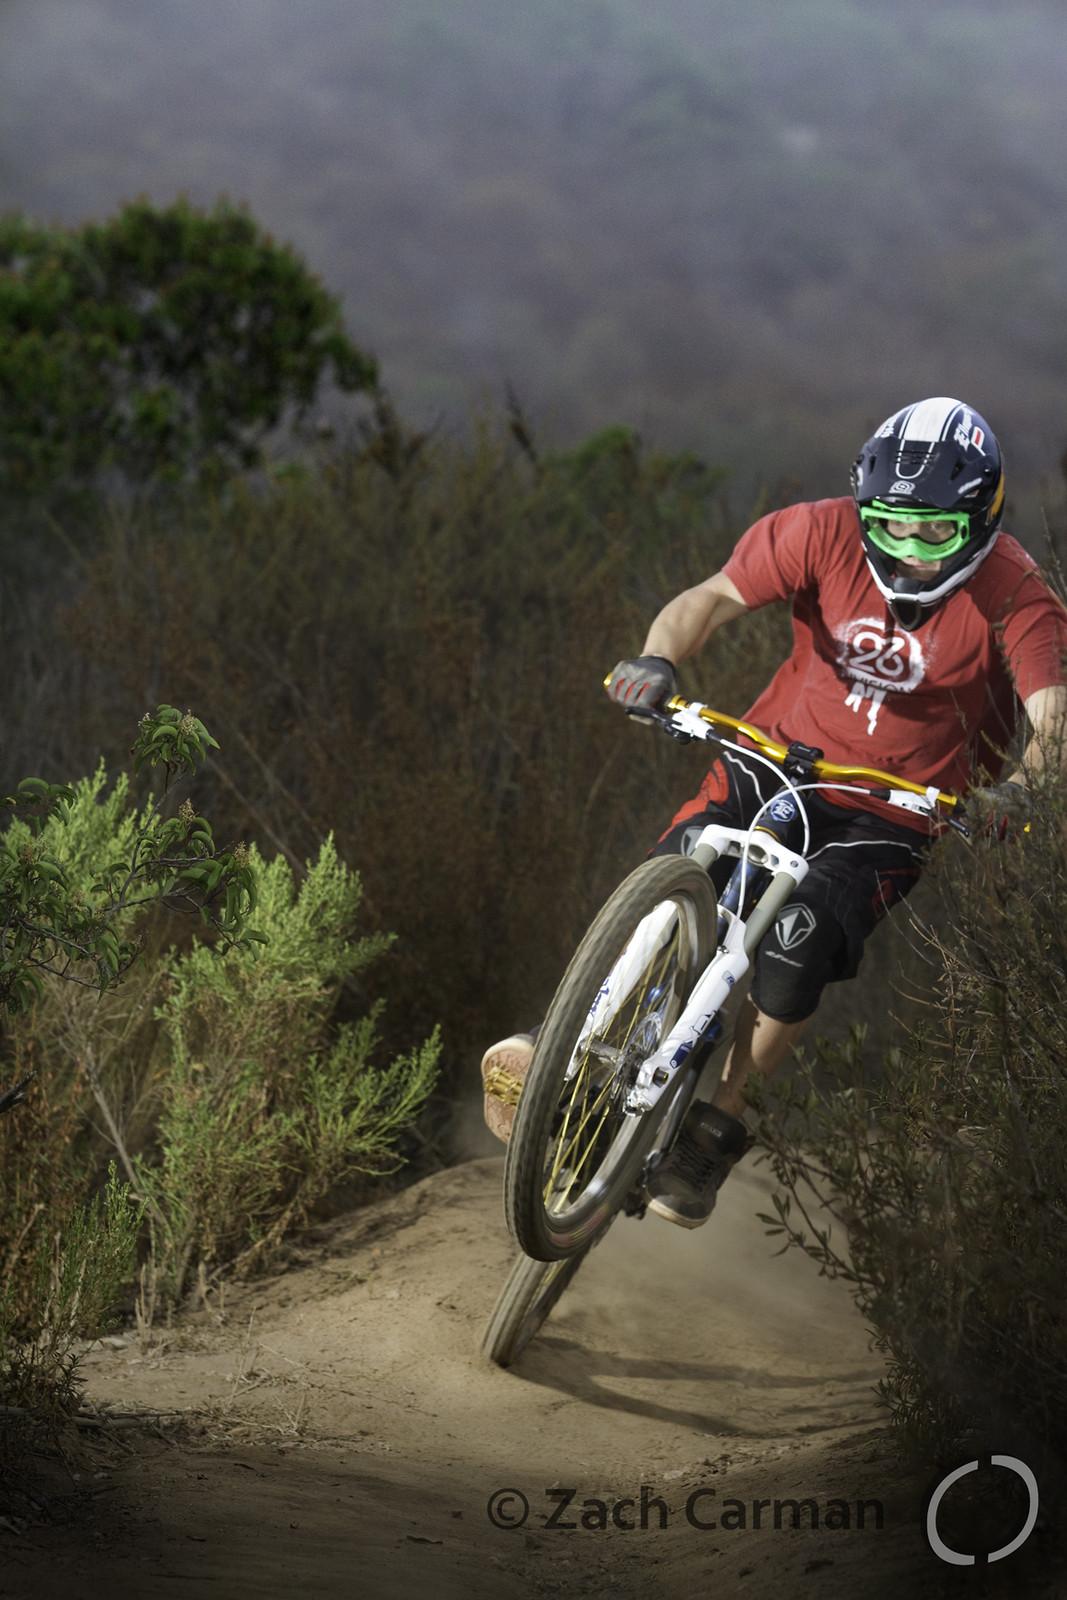 James Visser - Captures by Carman - Mountain Biking Pictures - Vital MTB